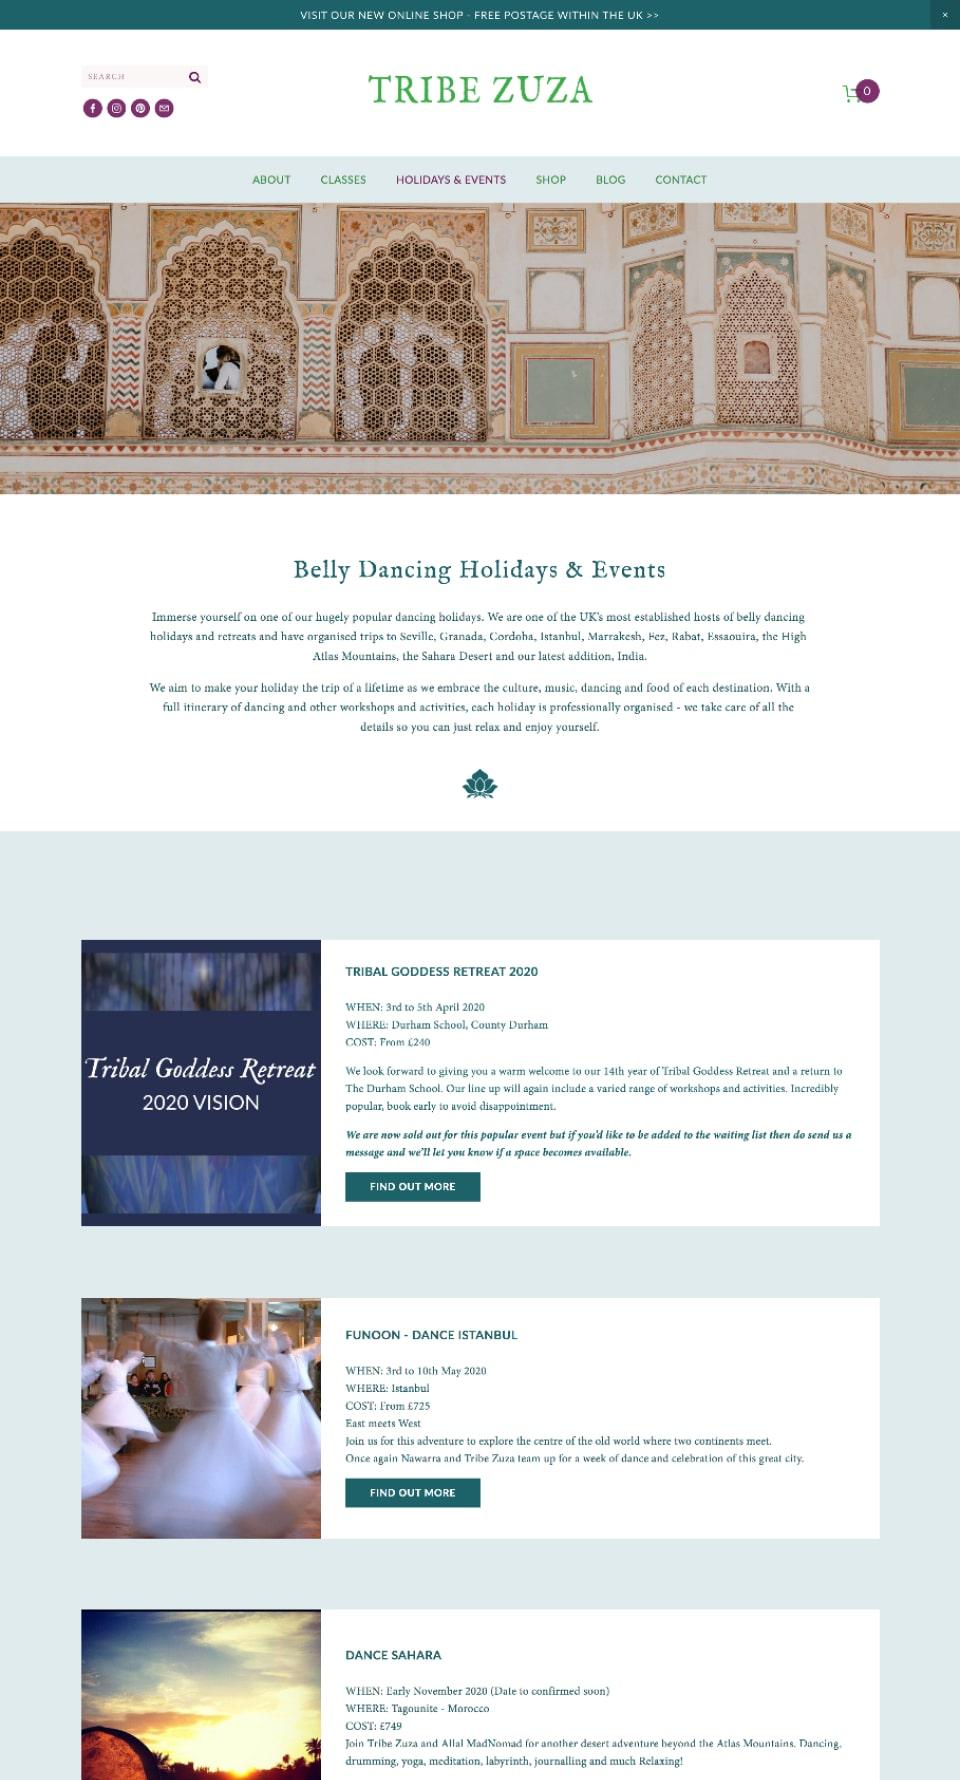 Tribe Zuza Website  Holidays & Retreats  Page